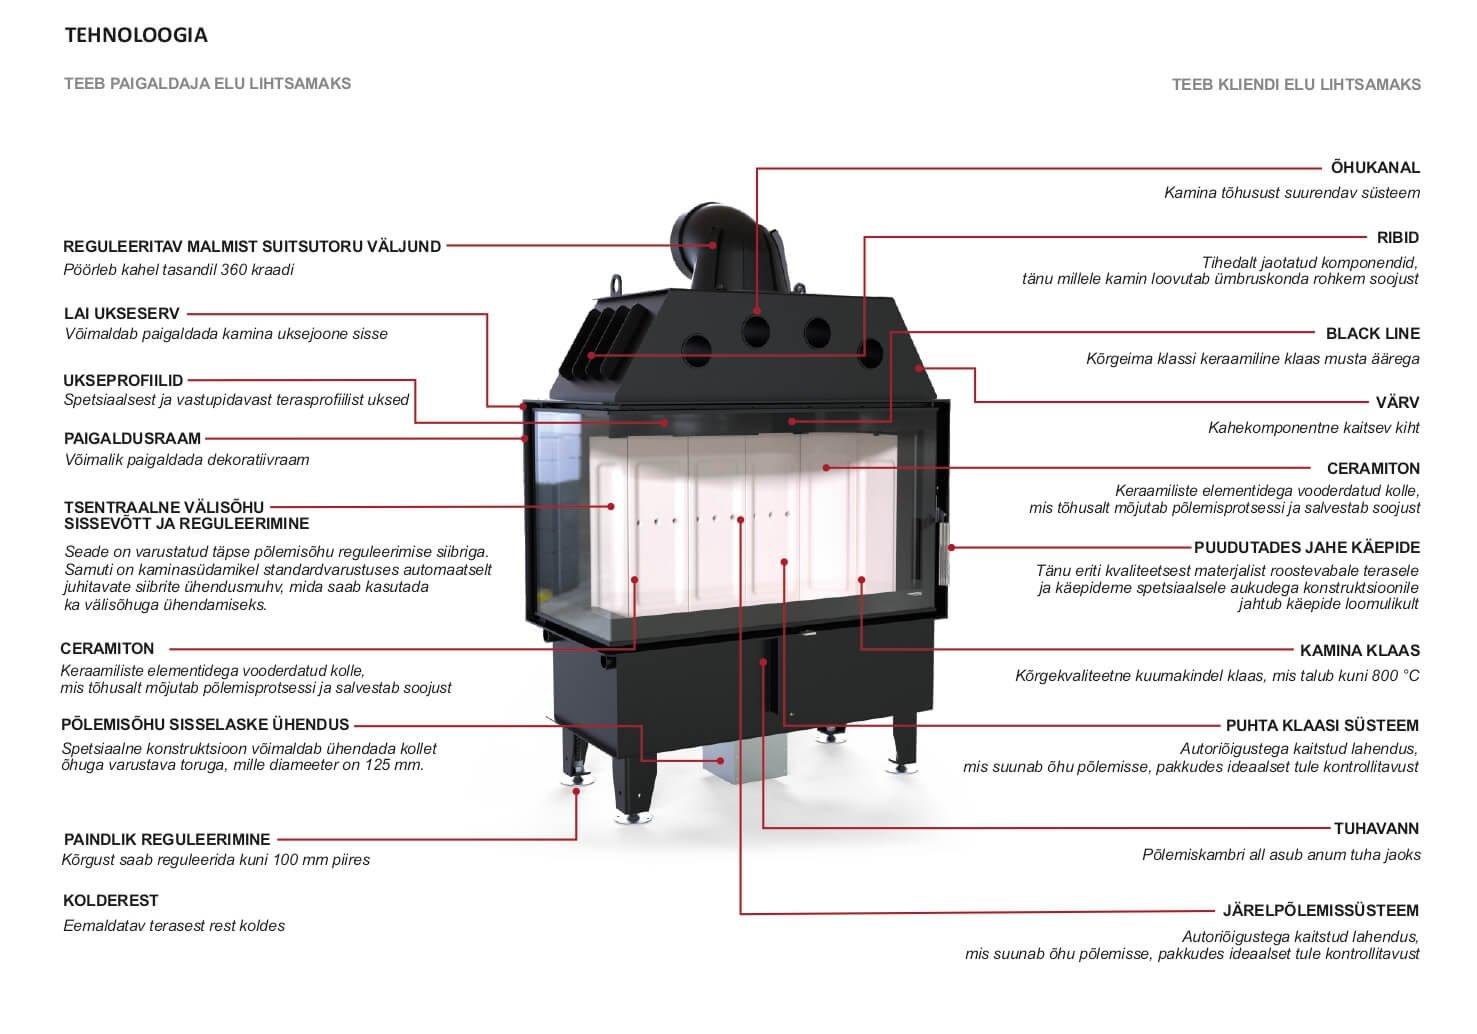 Defro Home Kaminasüdamik Intra BL tehnoloogia